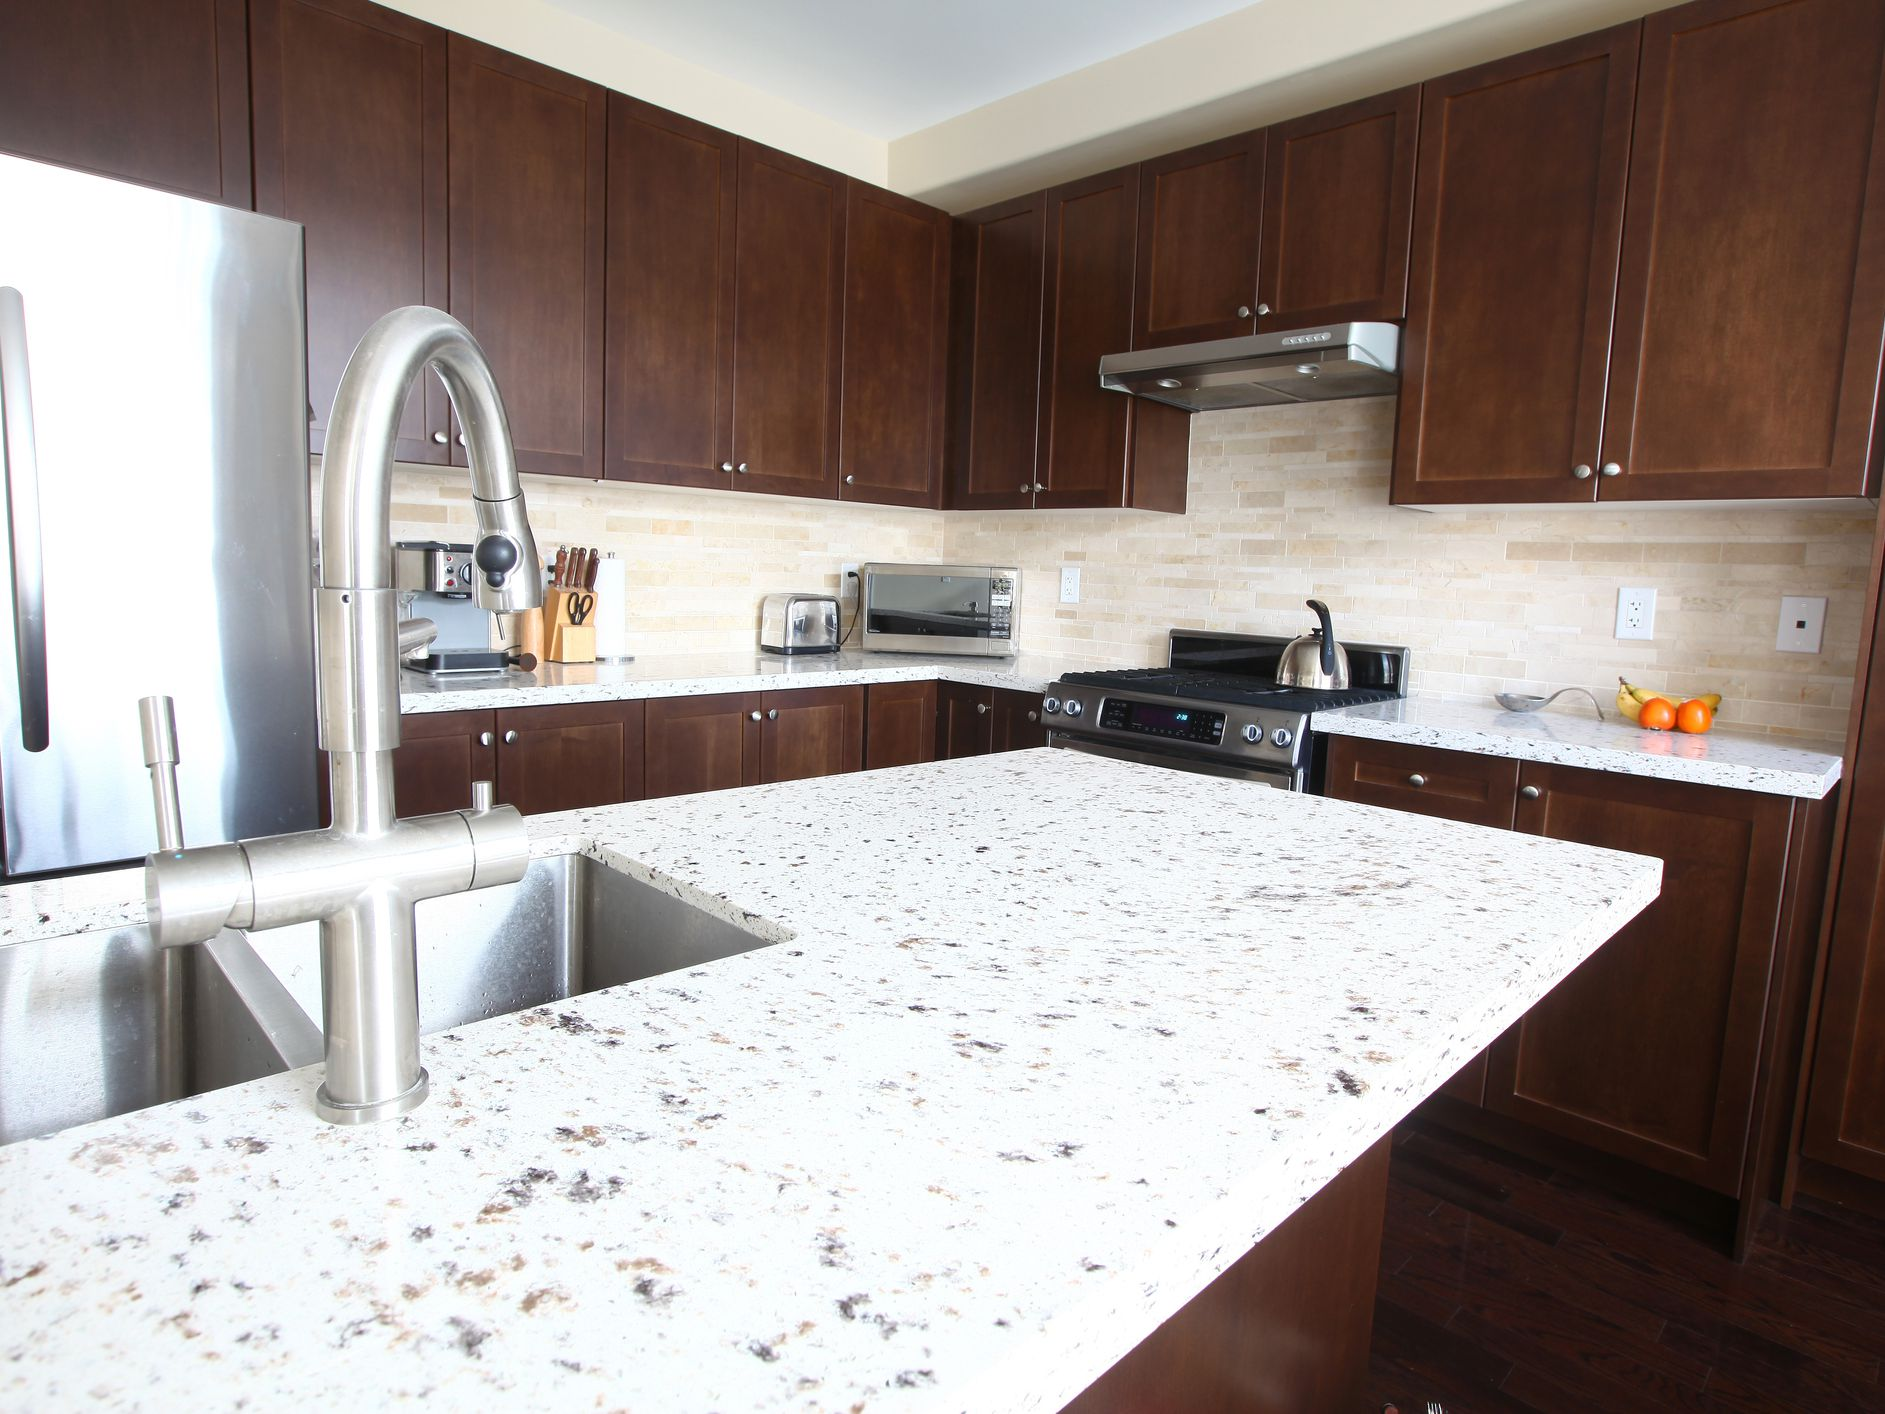 The Best Quartz Countertop Alternatives To White Marble